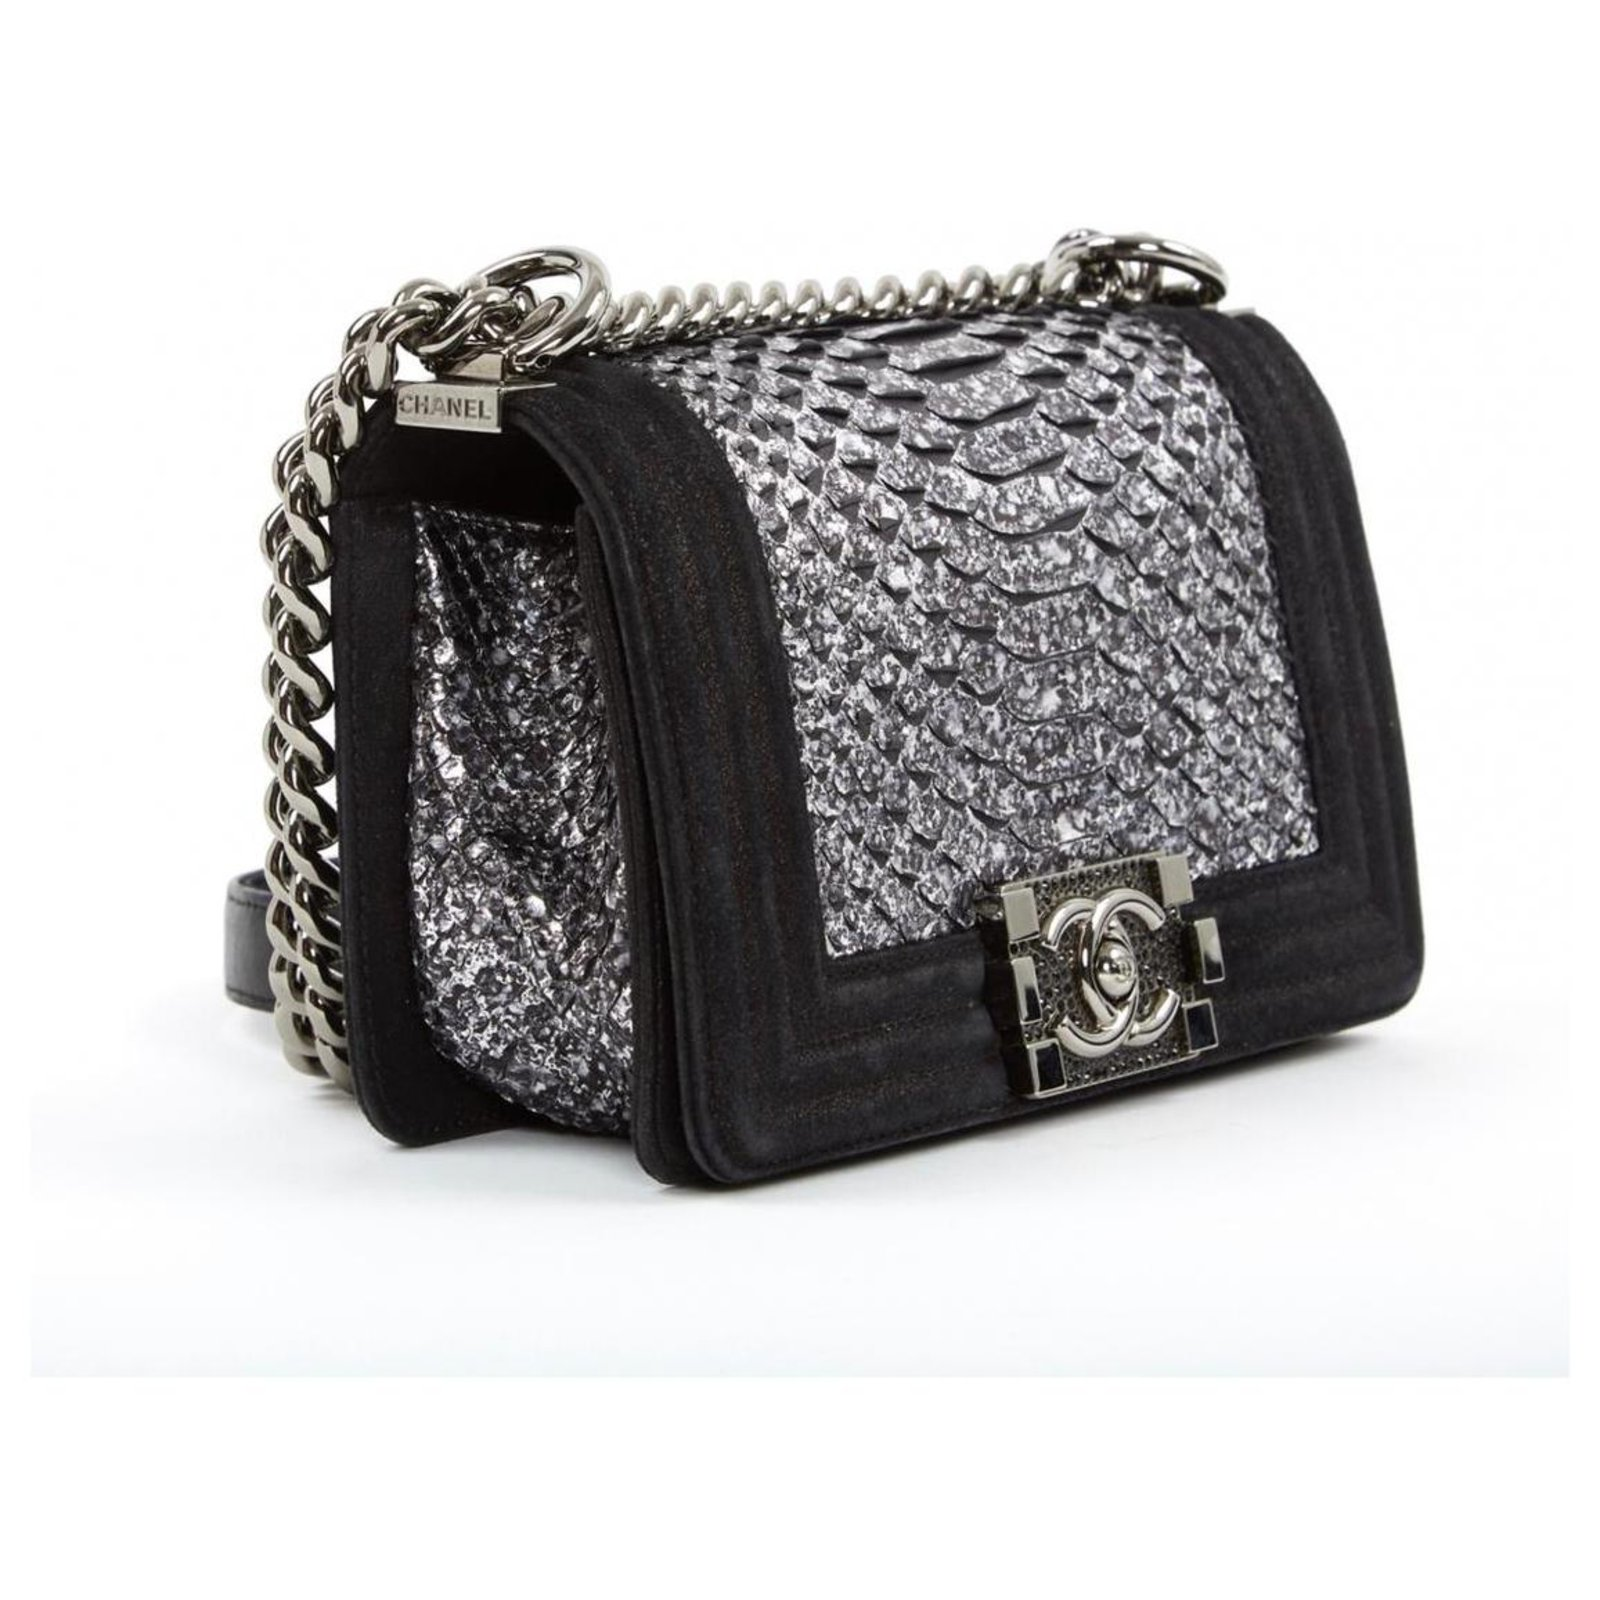 4633bcf890c139 Chanel CHANEL BOY PYTHON RARE! Handbags Exotic leather,Python Black,Silvery  ref.120421 - Joli Closet